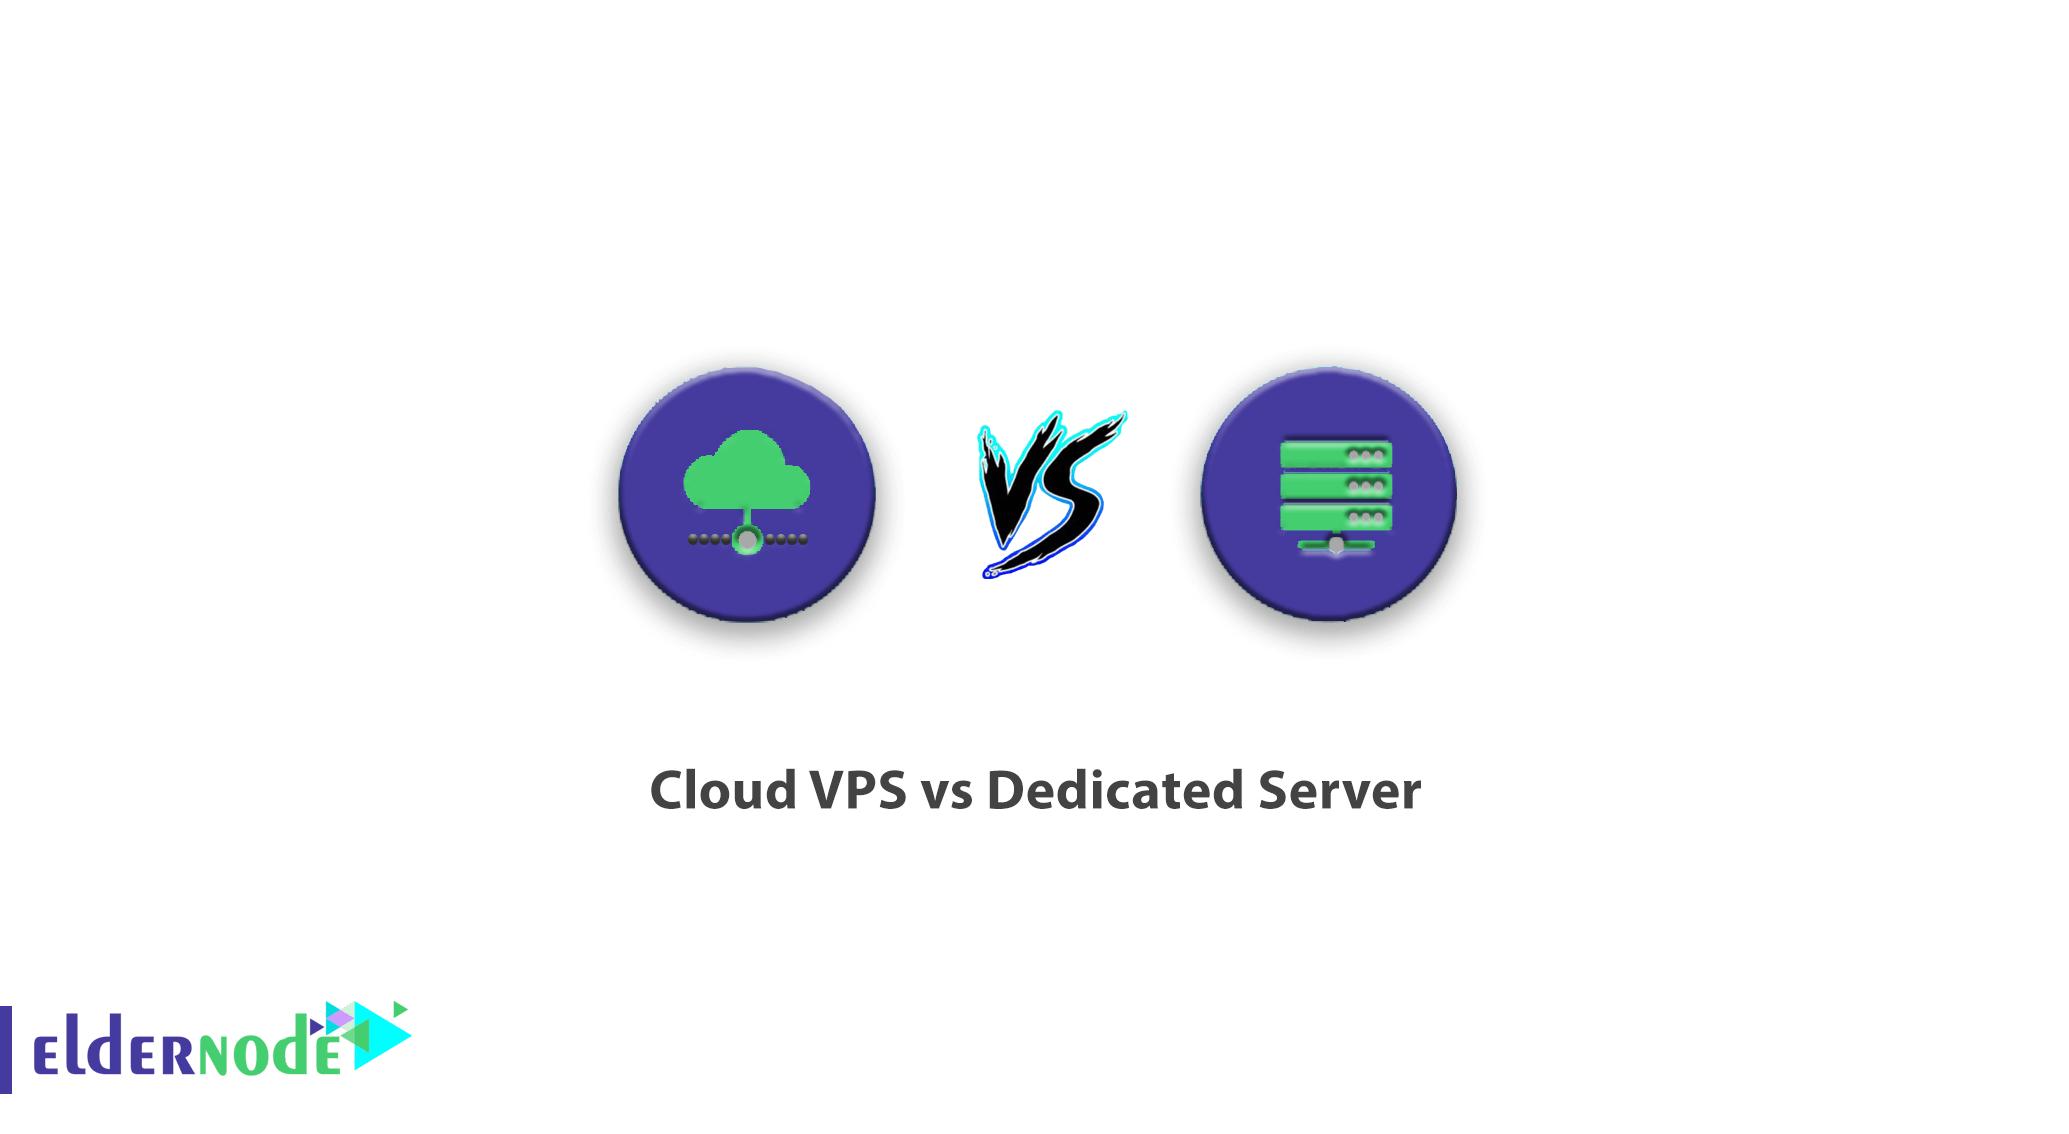 Cloud VPS vs Dedicated Server